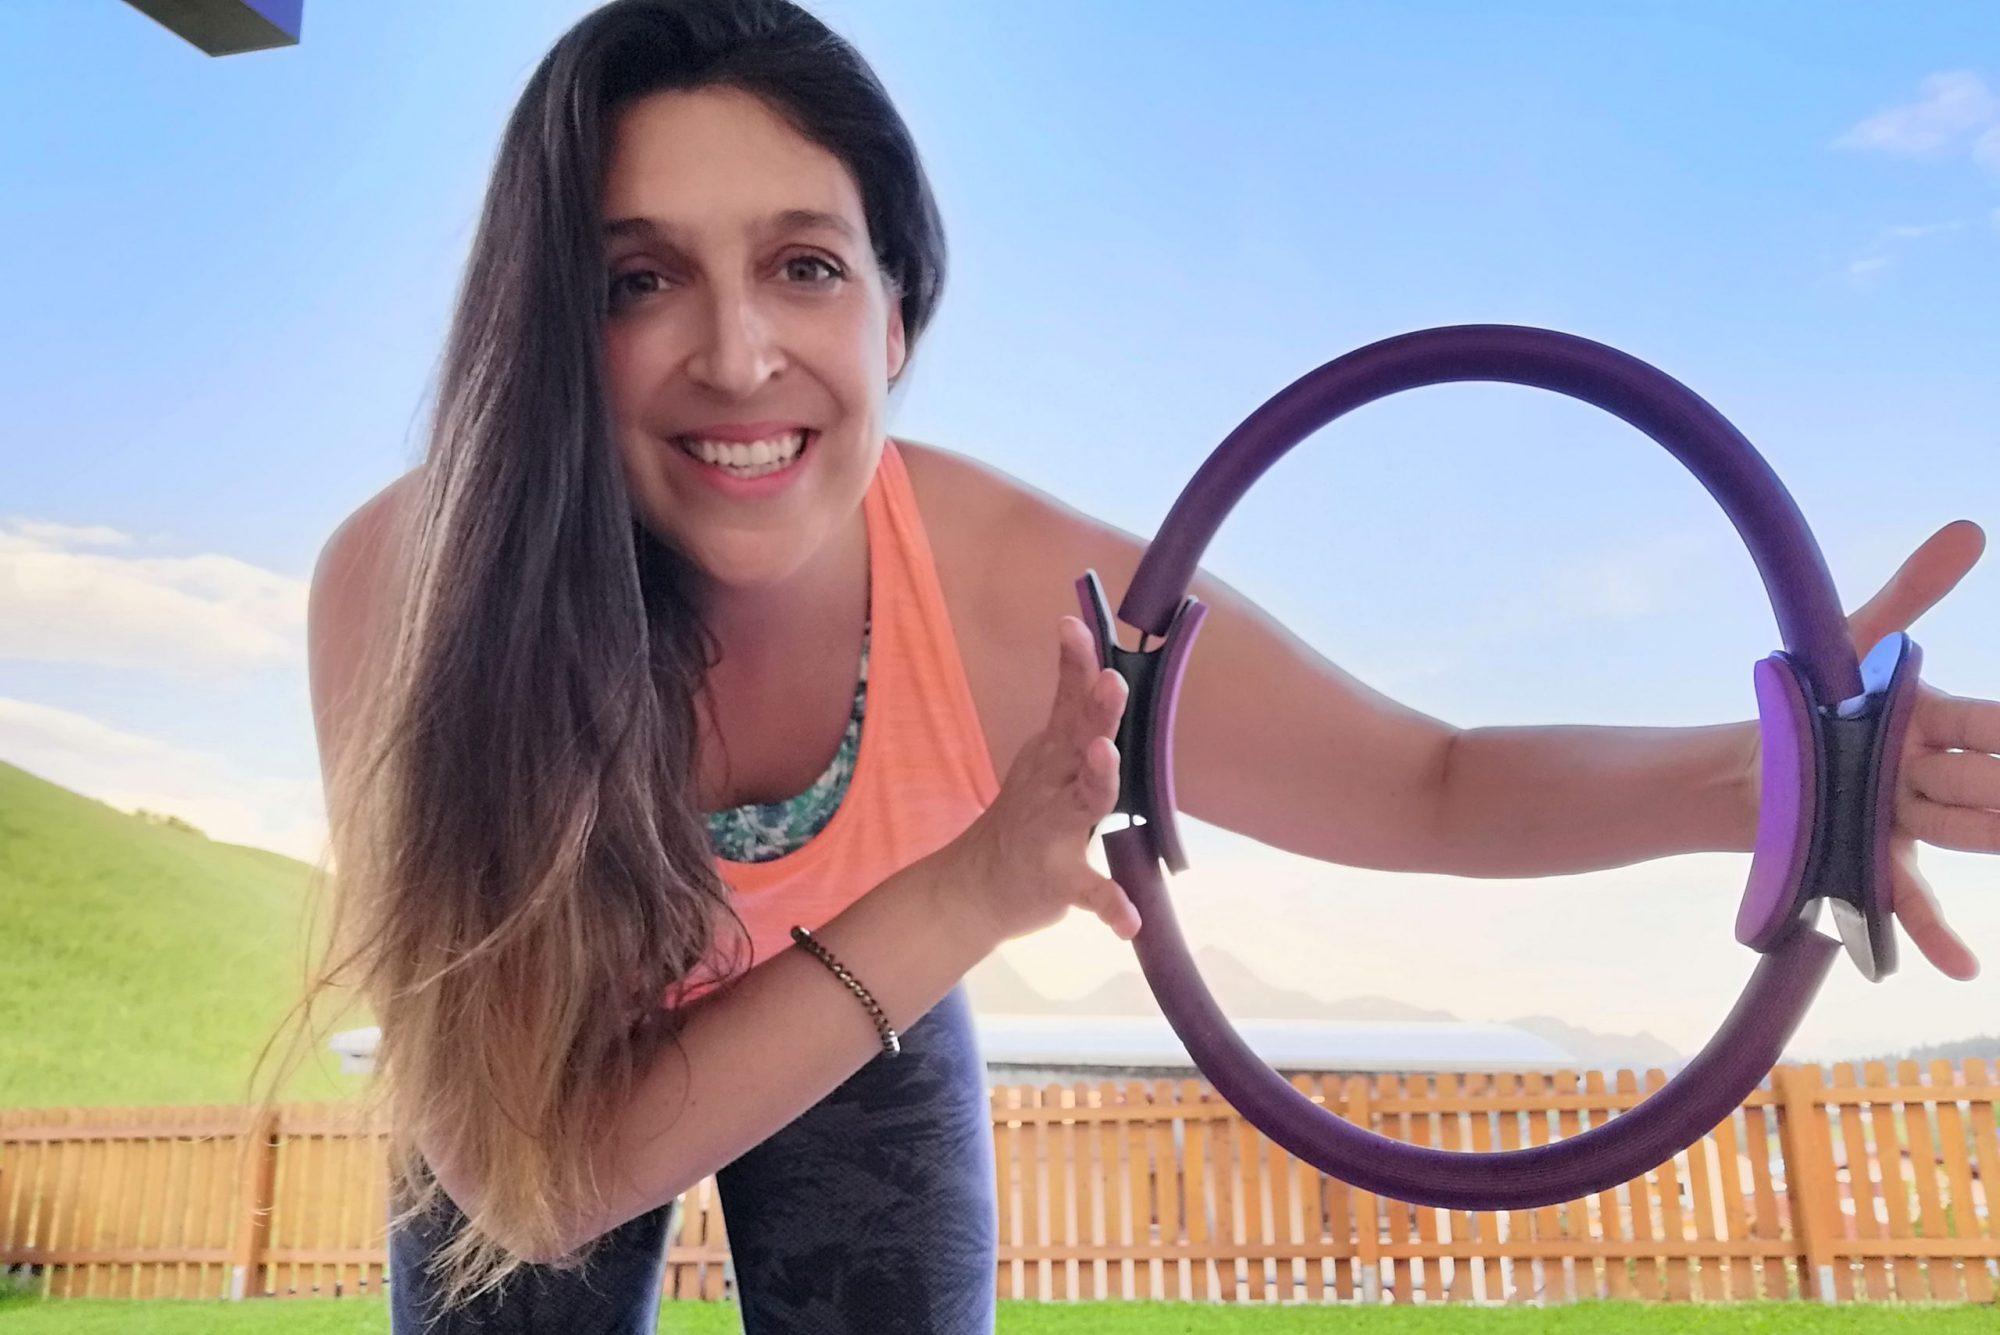 Claudia mit Pilatesring / Magic Circle